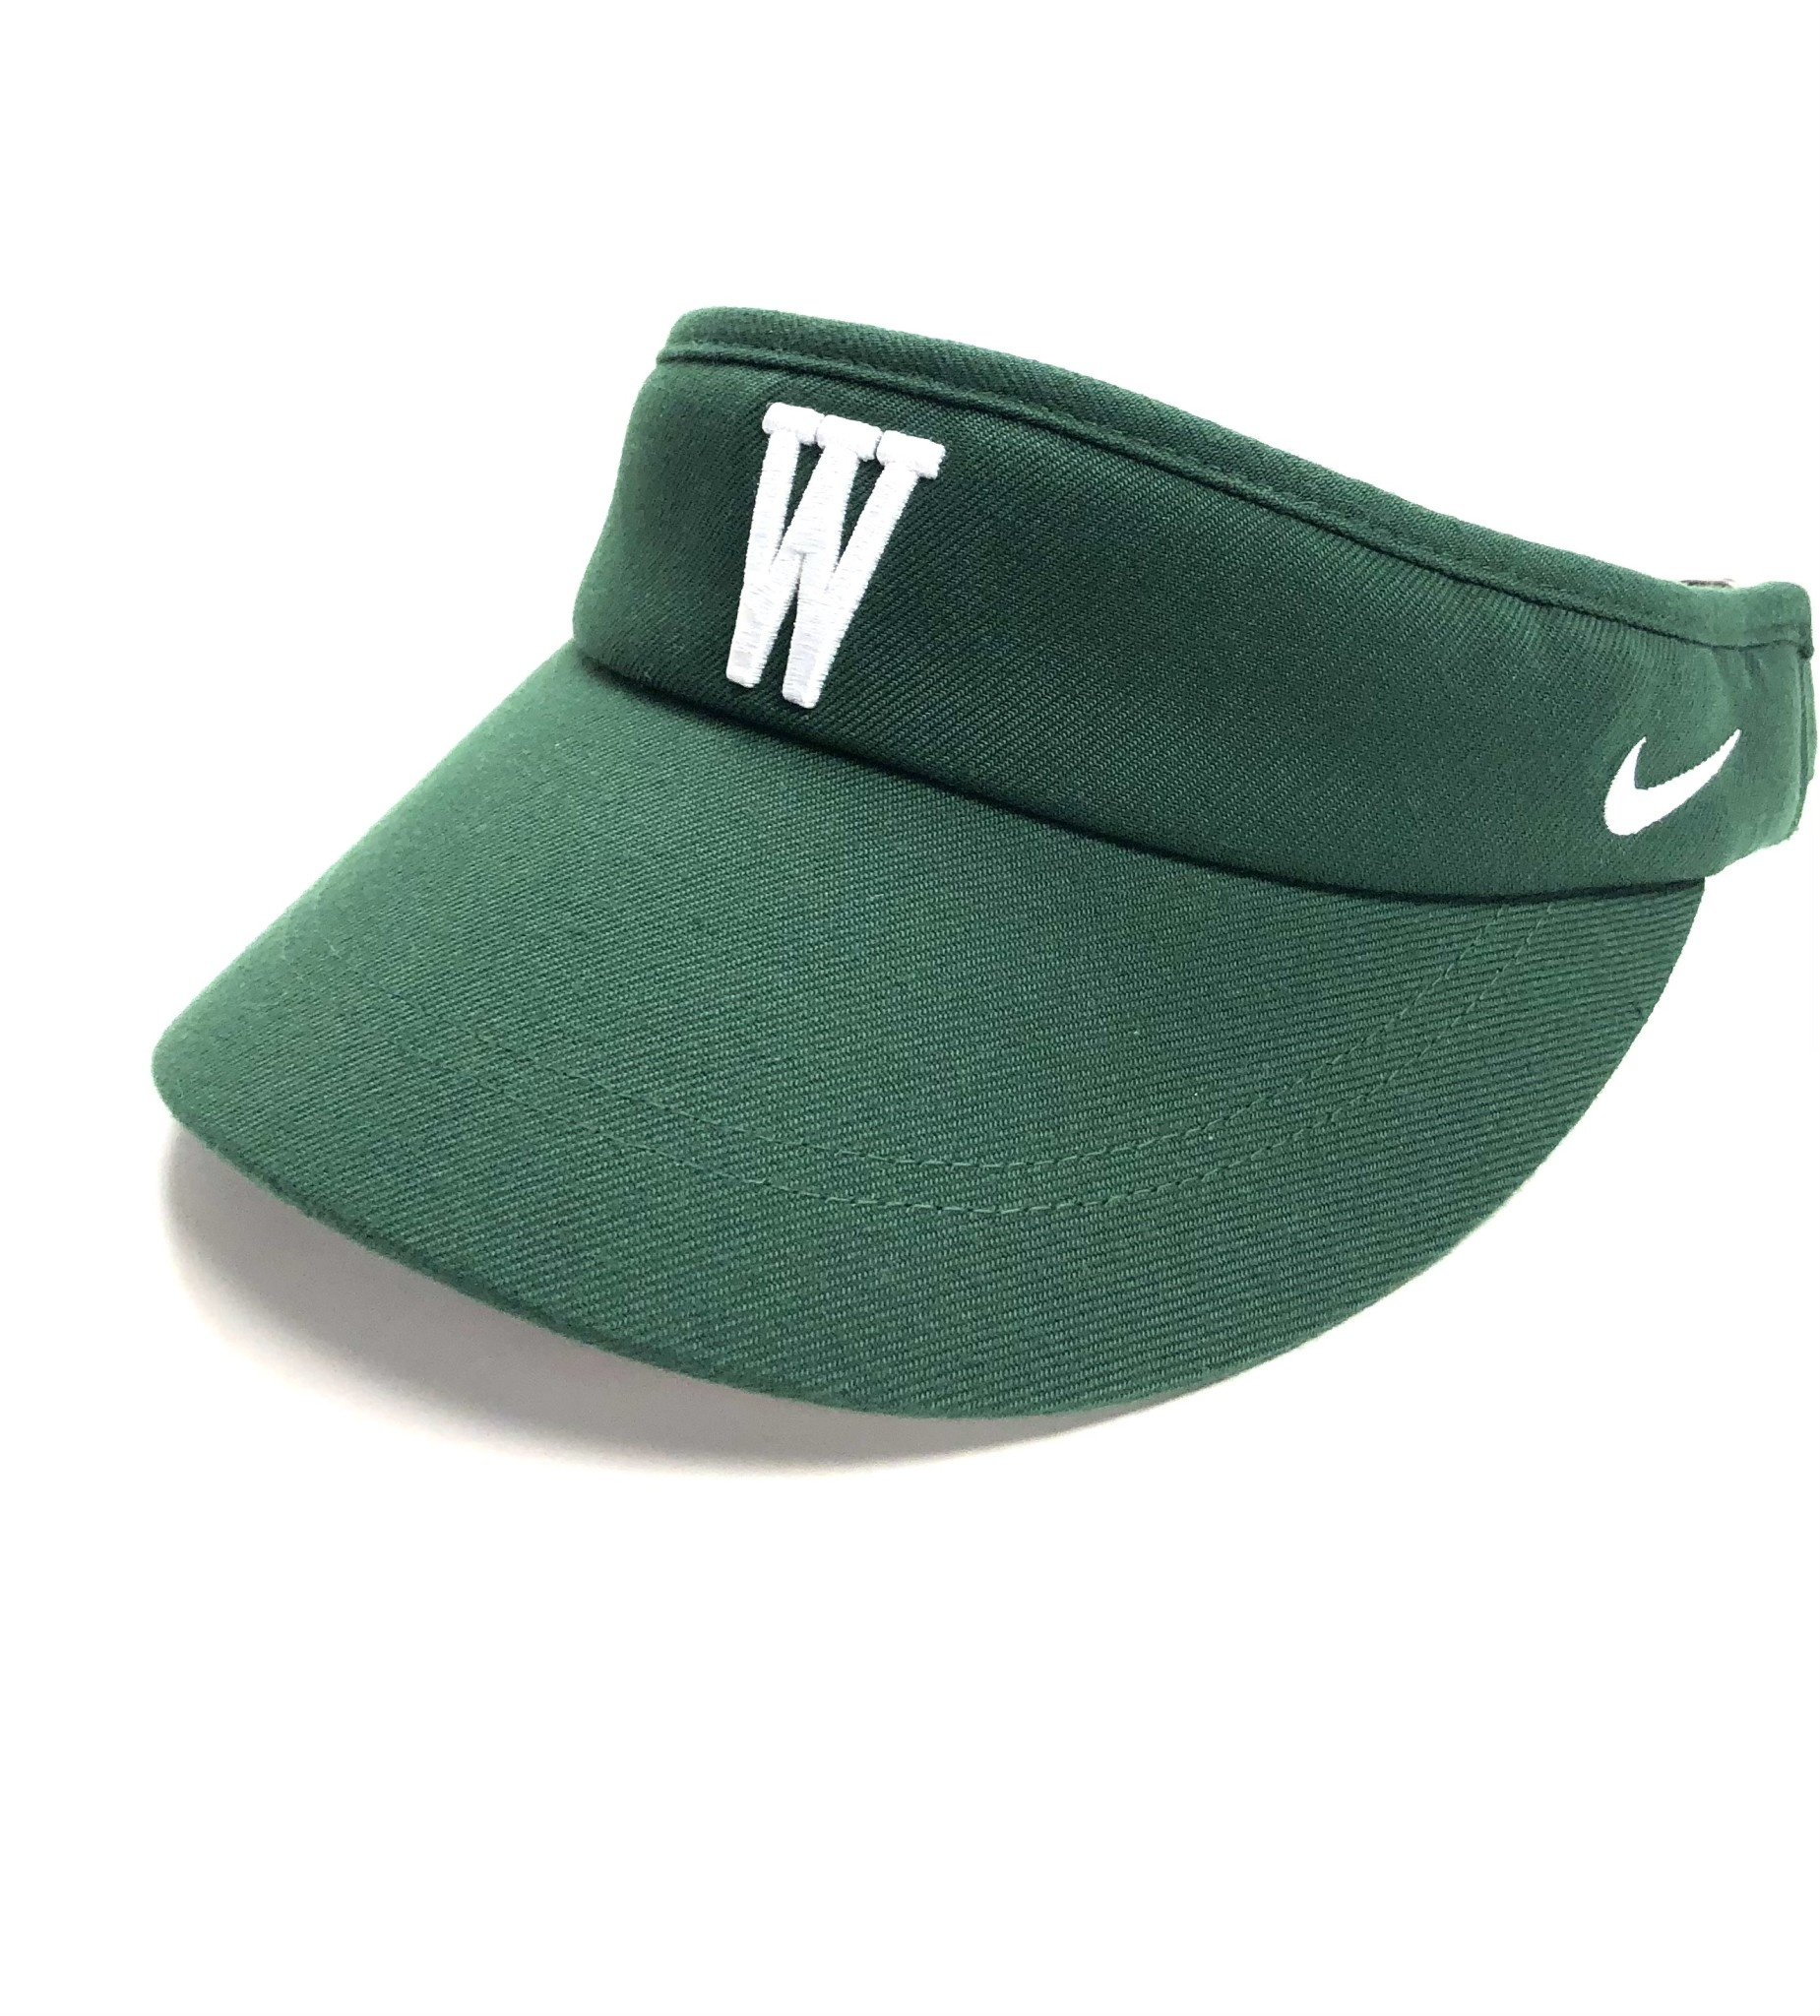 Nike Hat: Nike Dri-Fit Sideline Visor Green